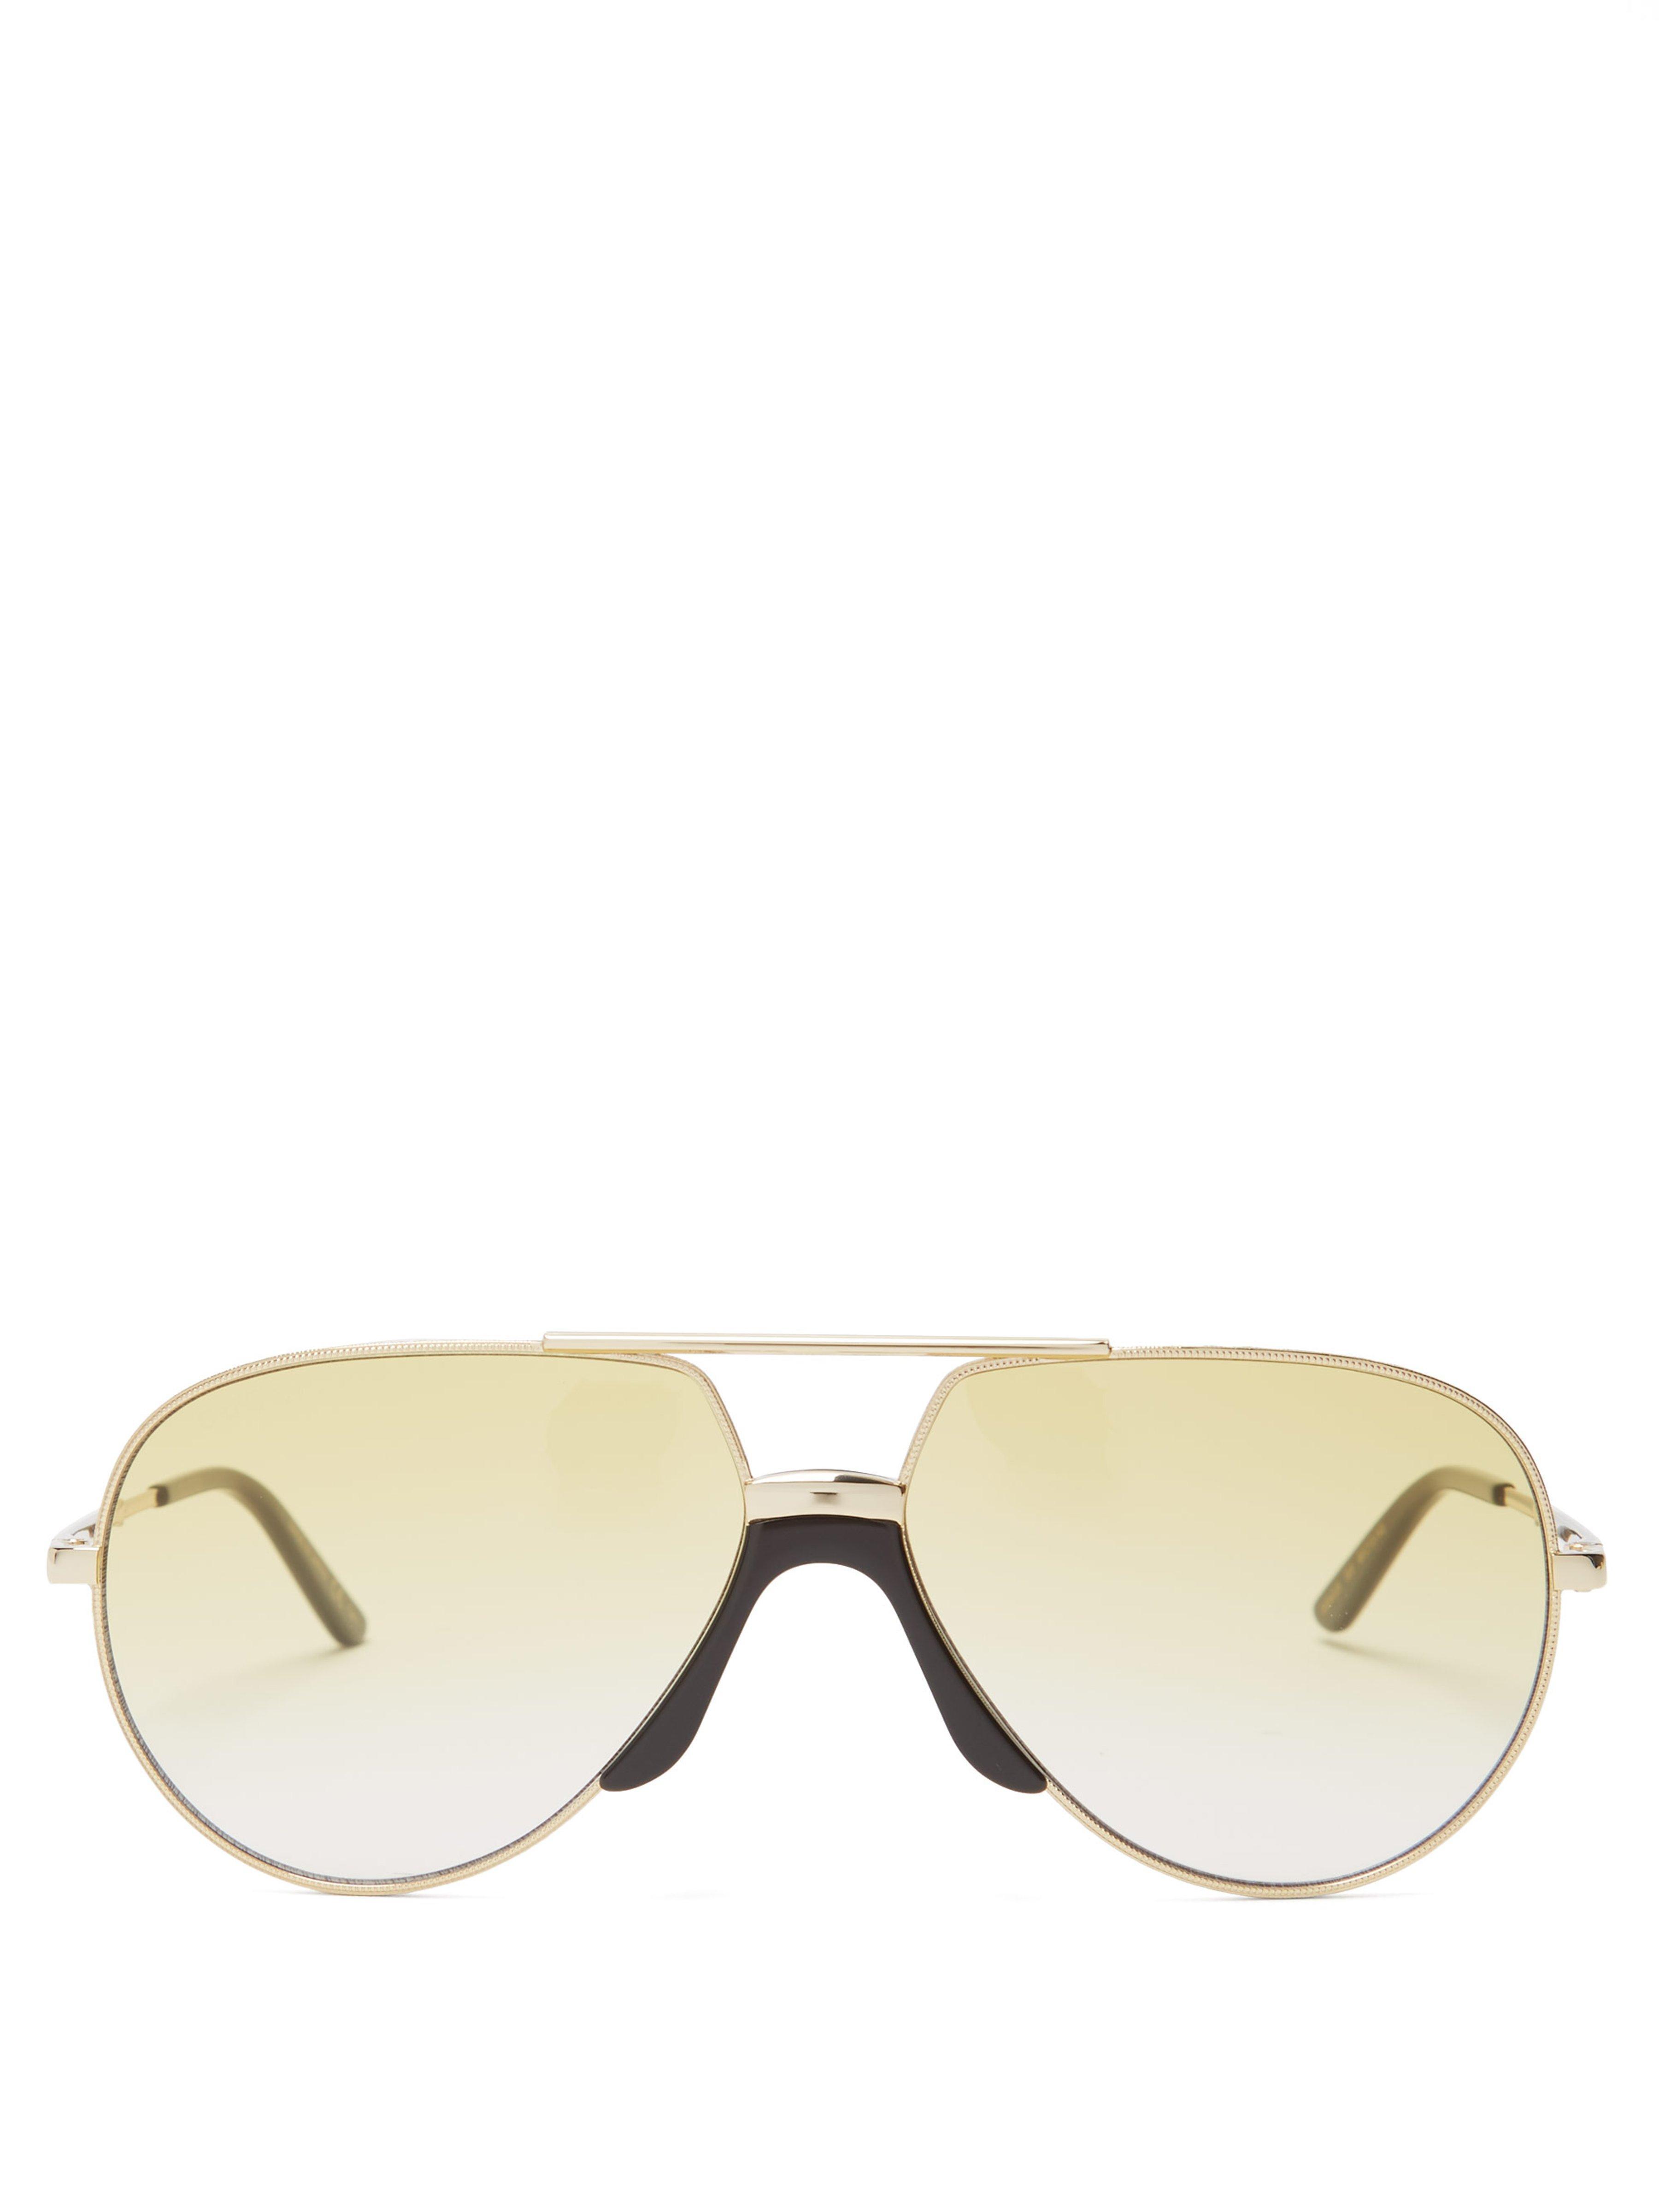 8c34642666b7 Gucci Aviator Metal Sunglasses in Metallic for Men - Lyst